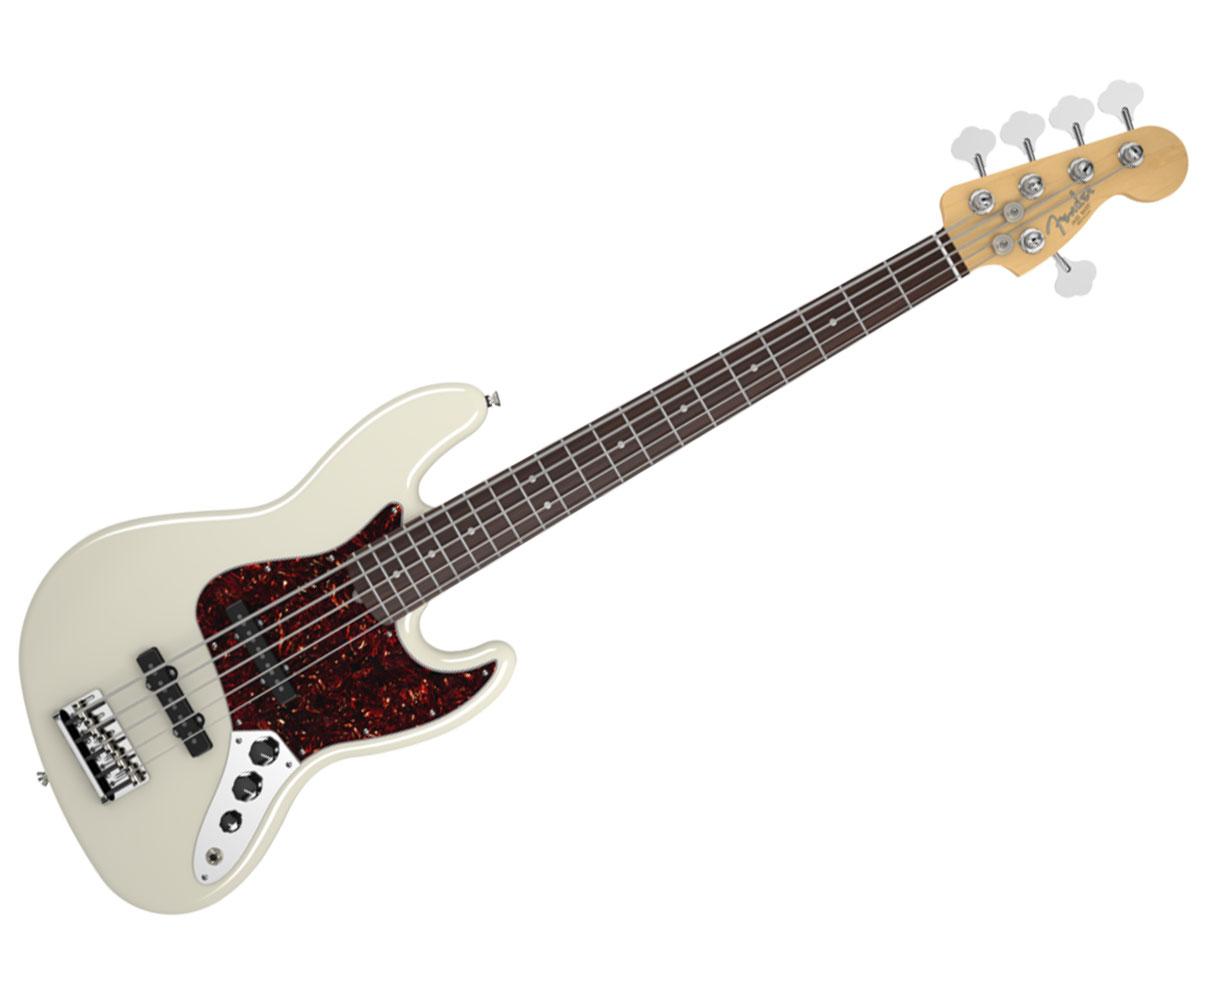 fender american standard jazz bass v five string rosewood white proaudiostar ebay. Black Bedroom Furniture Sets. Home Design Ideas